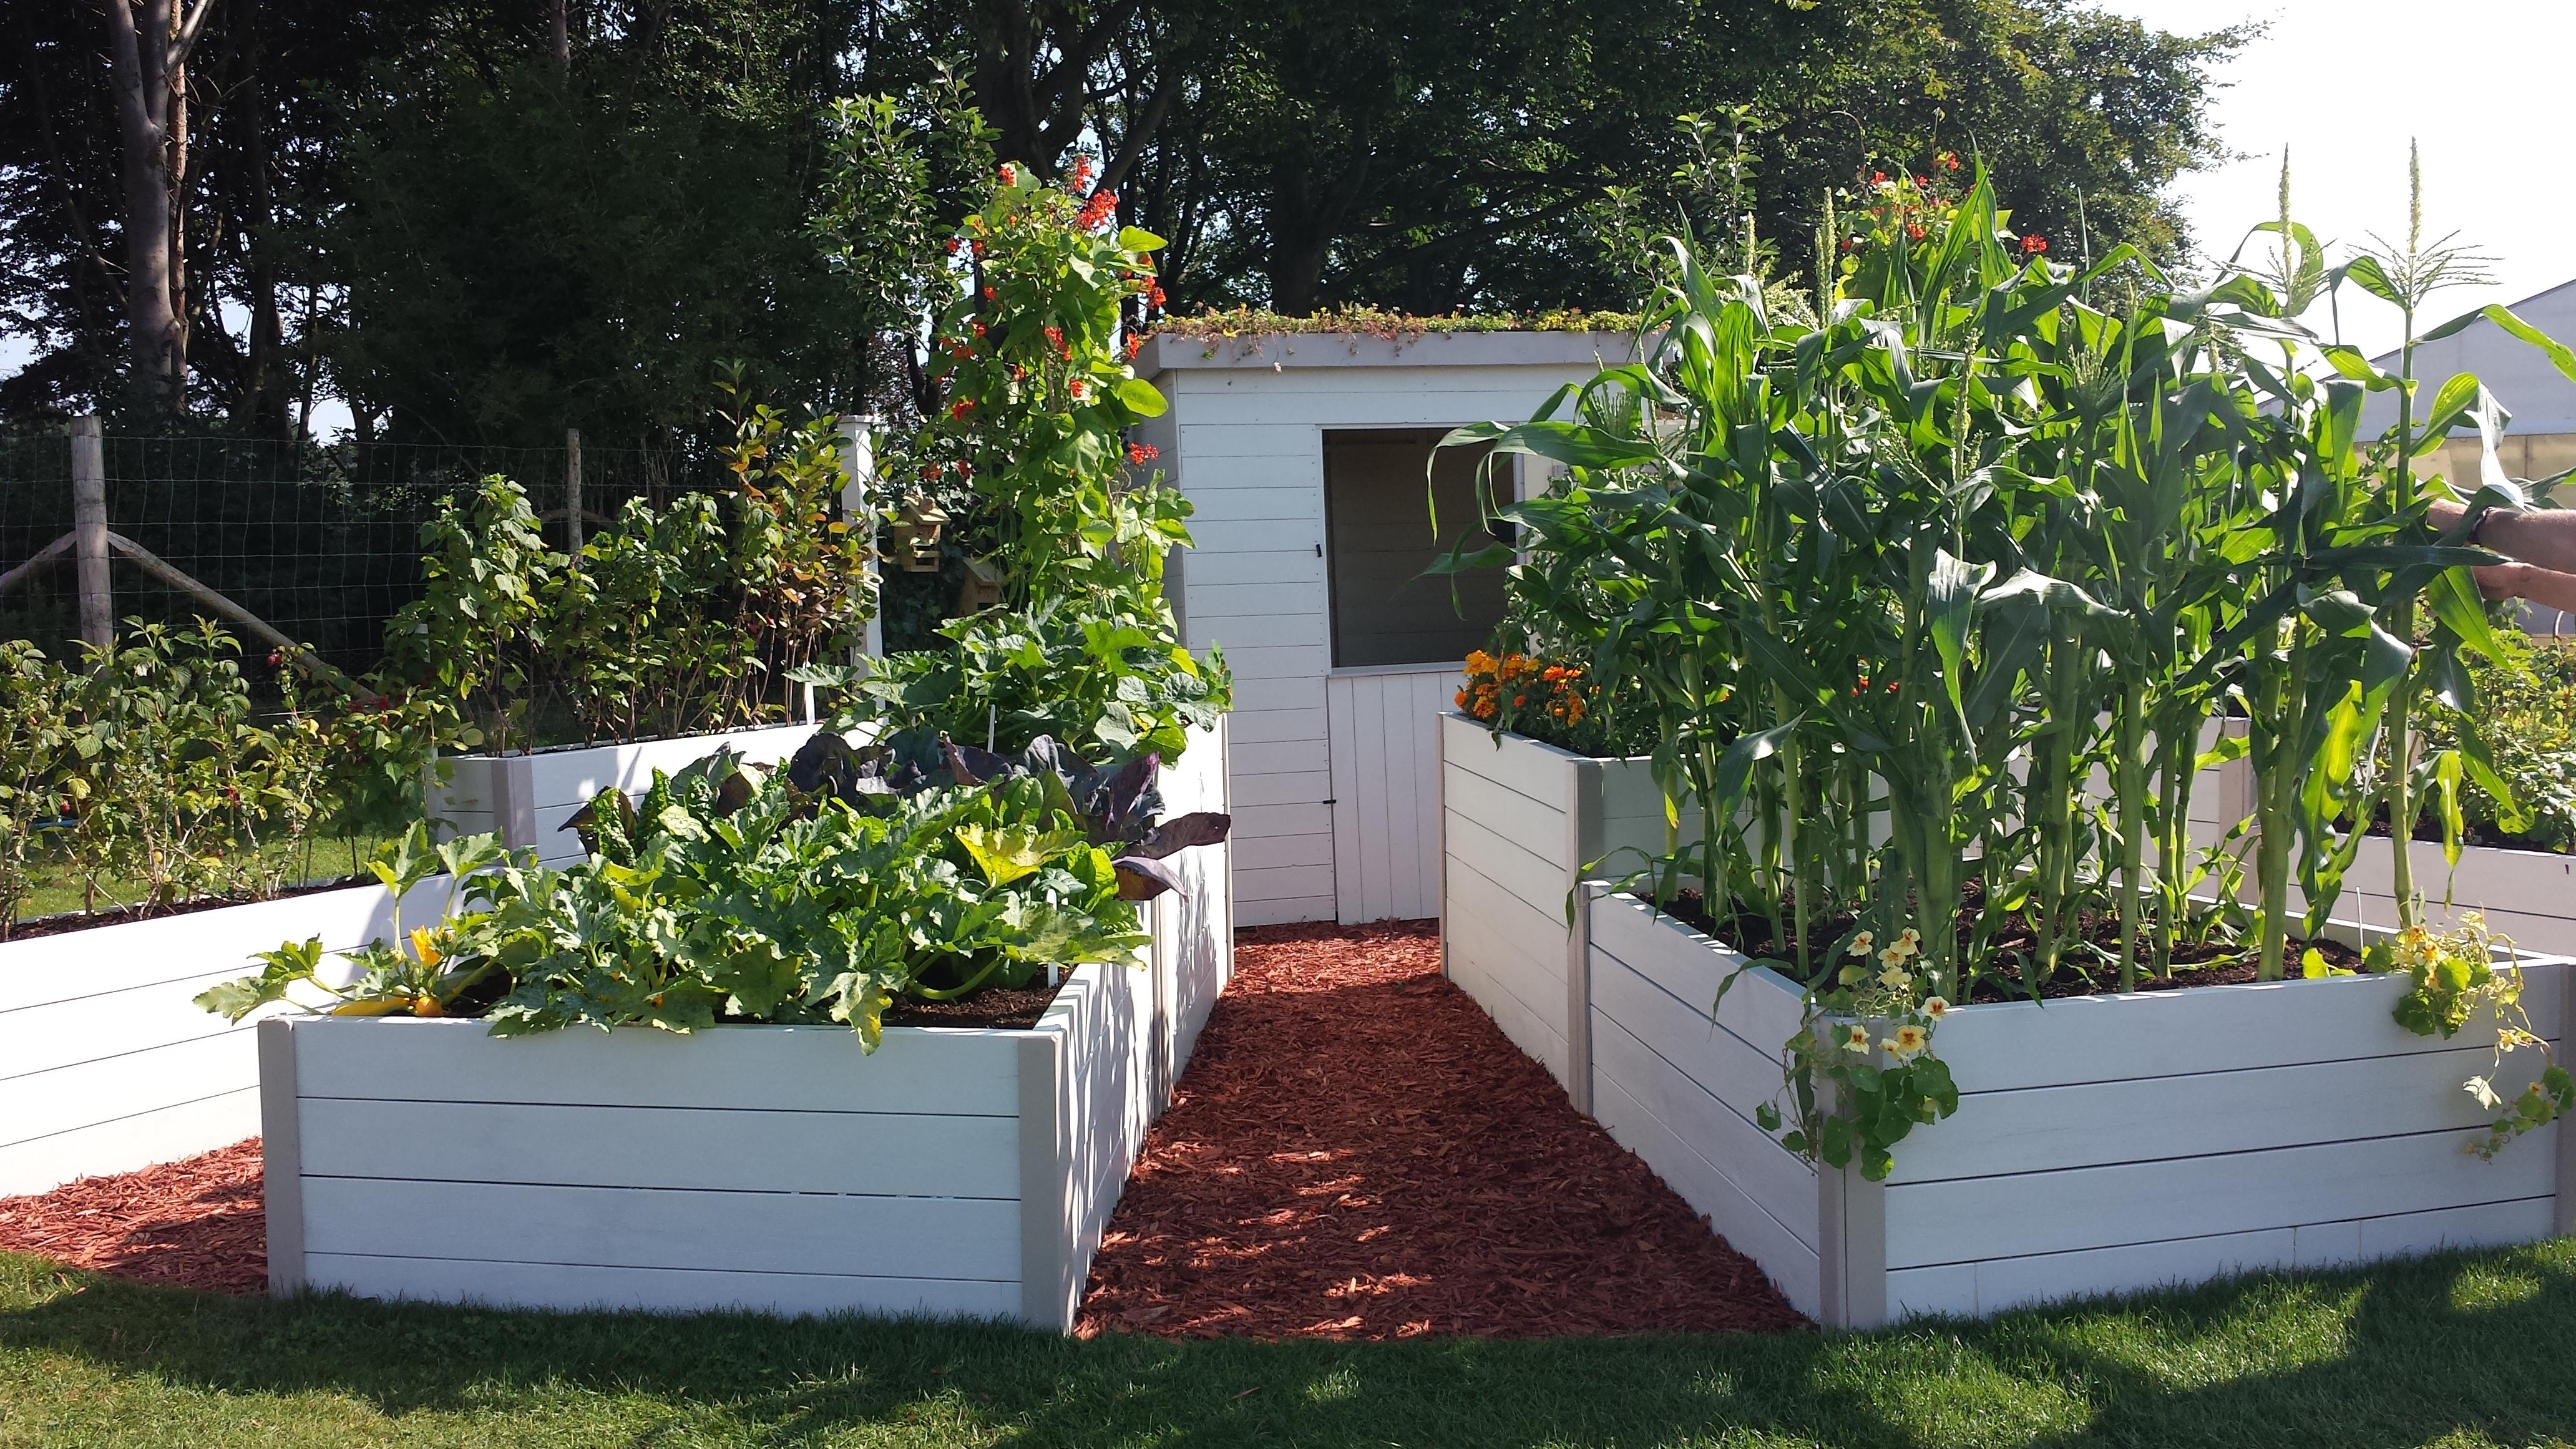 Grow your own vegetables jhps gardens jhps gardens for Grow your own vegetable garden